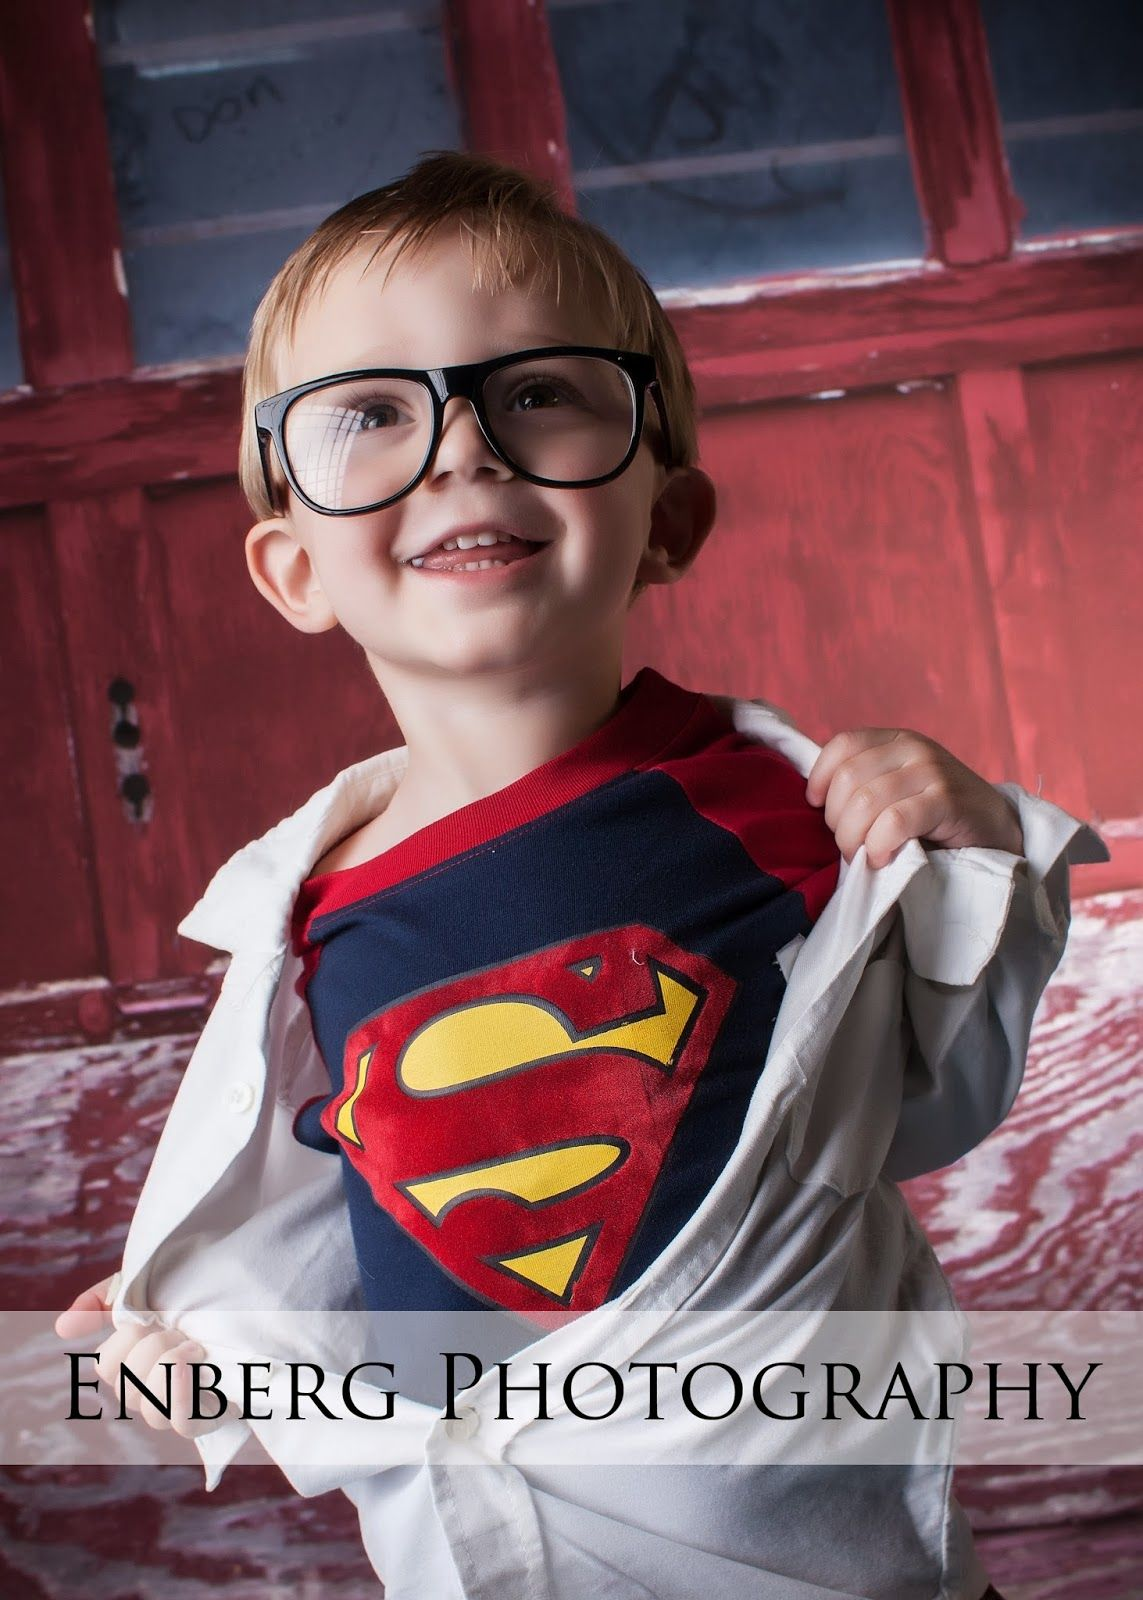 Enberg Photography {Babies & Children}